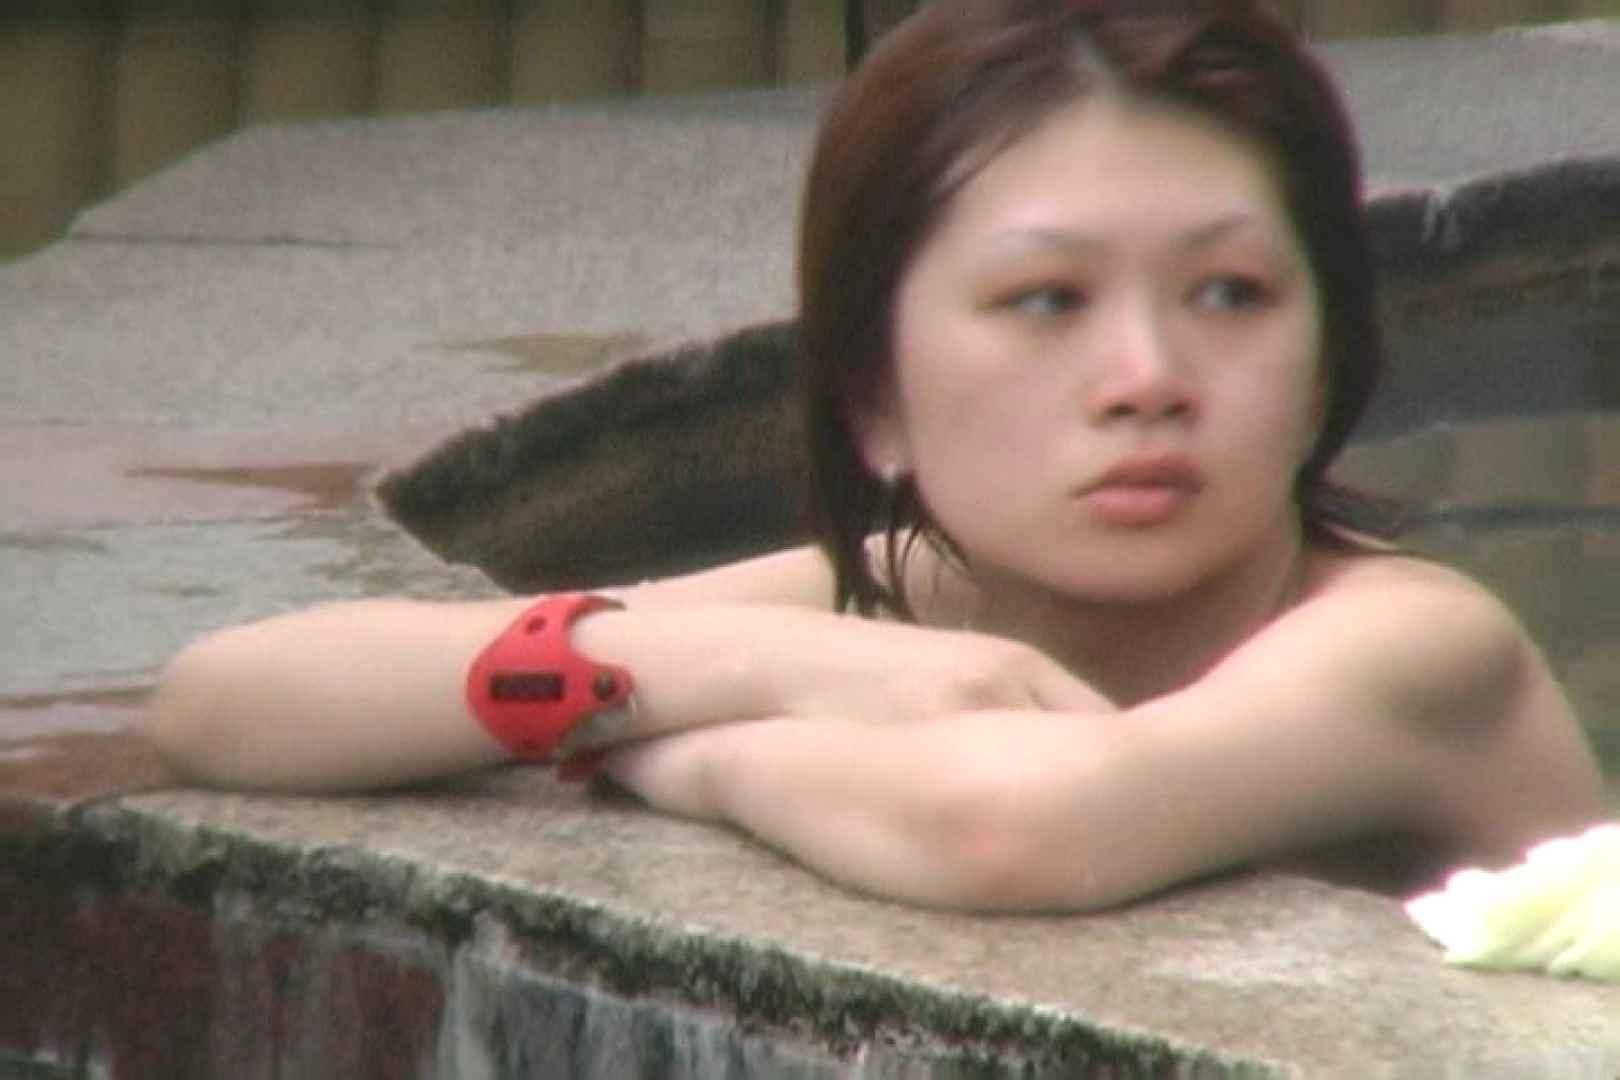 Aquaな露天風呂Vol.639 盗撮師作品 おめこ無修正動画無料 90pic 44